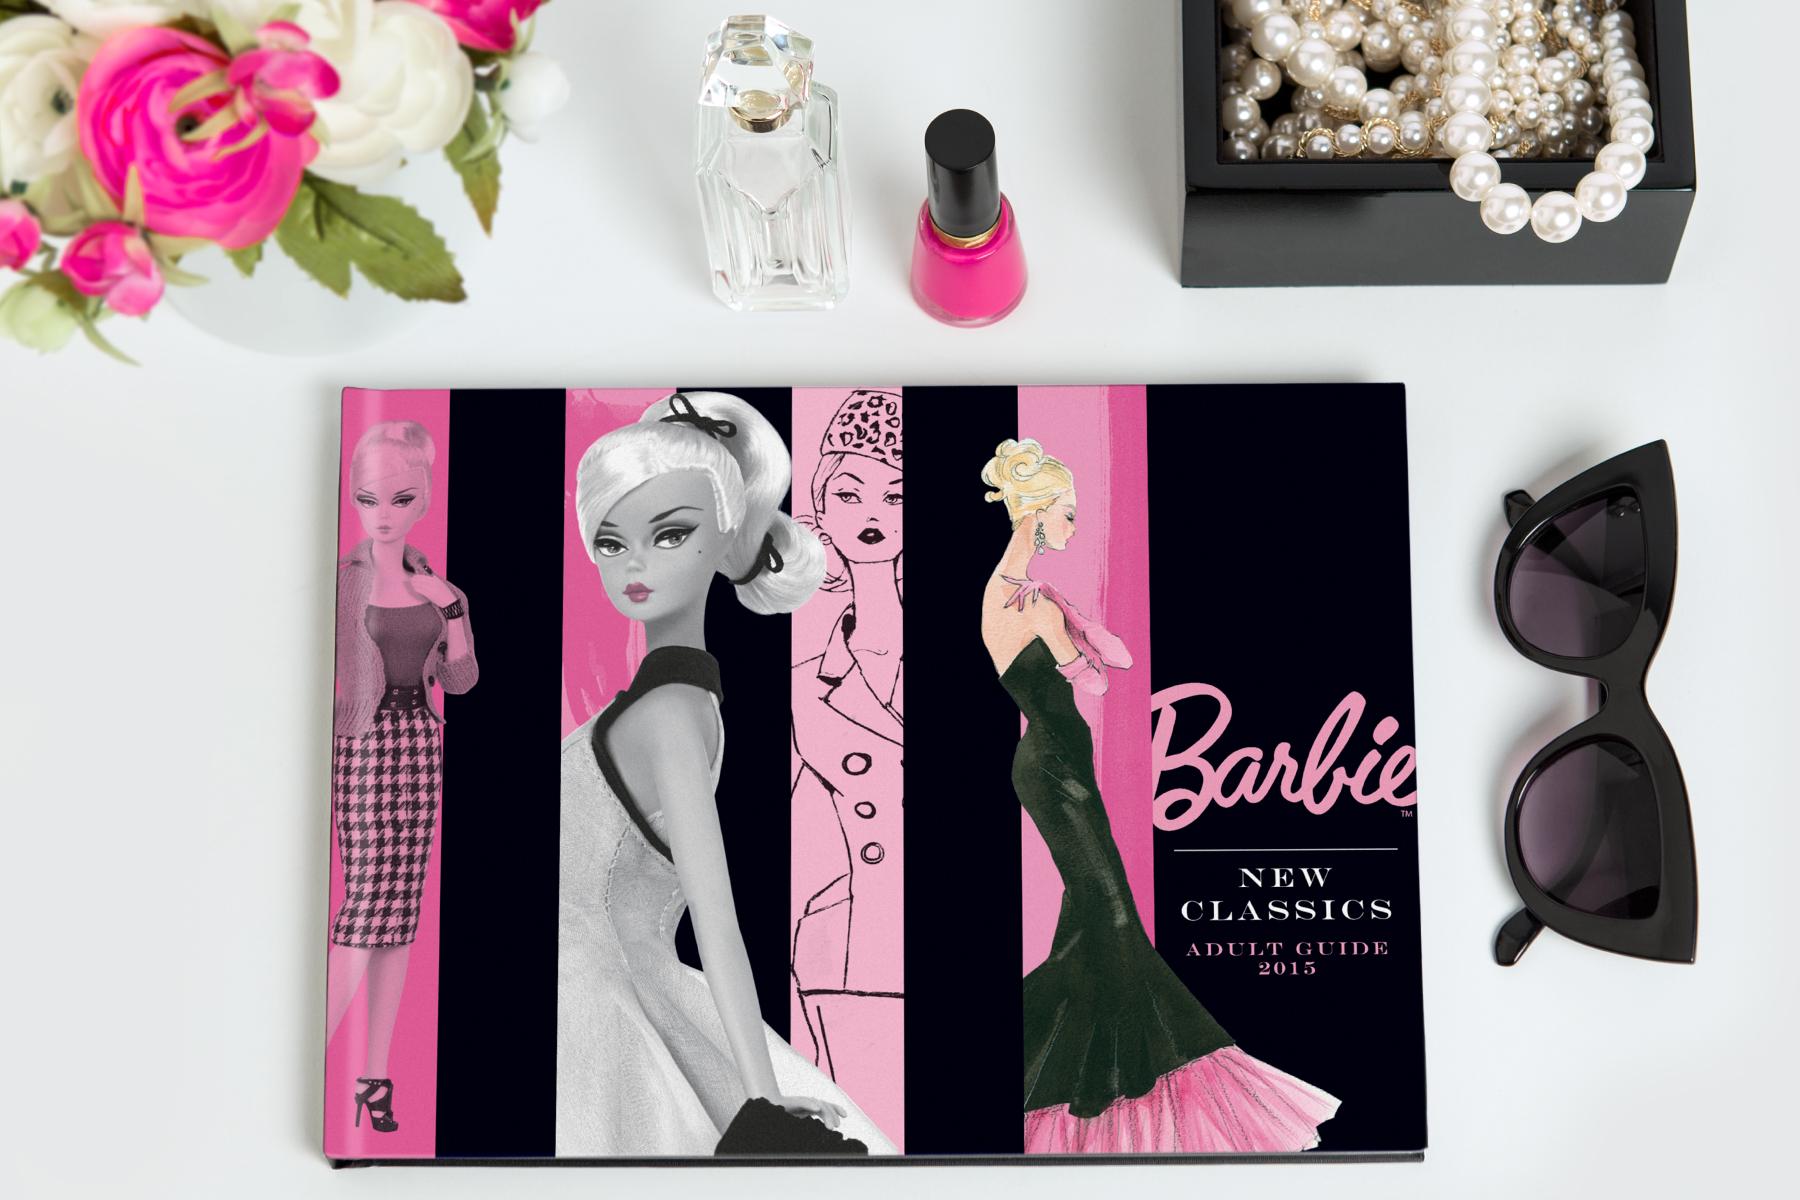 Barbie New Classics